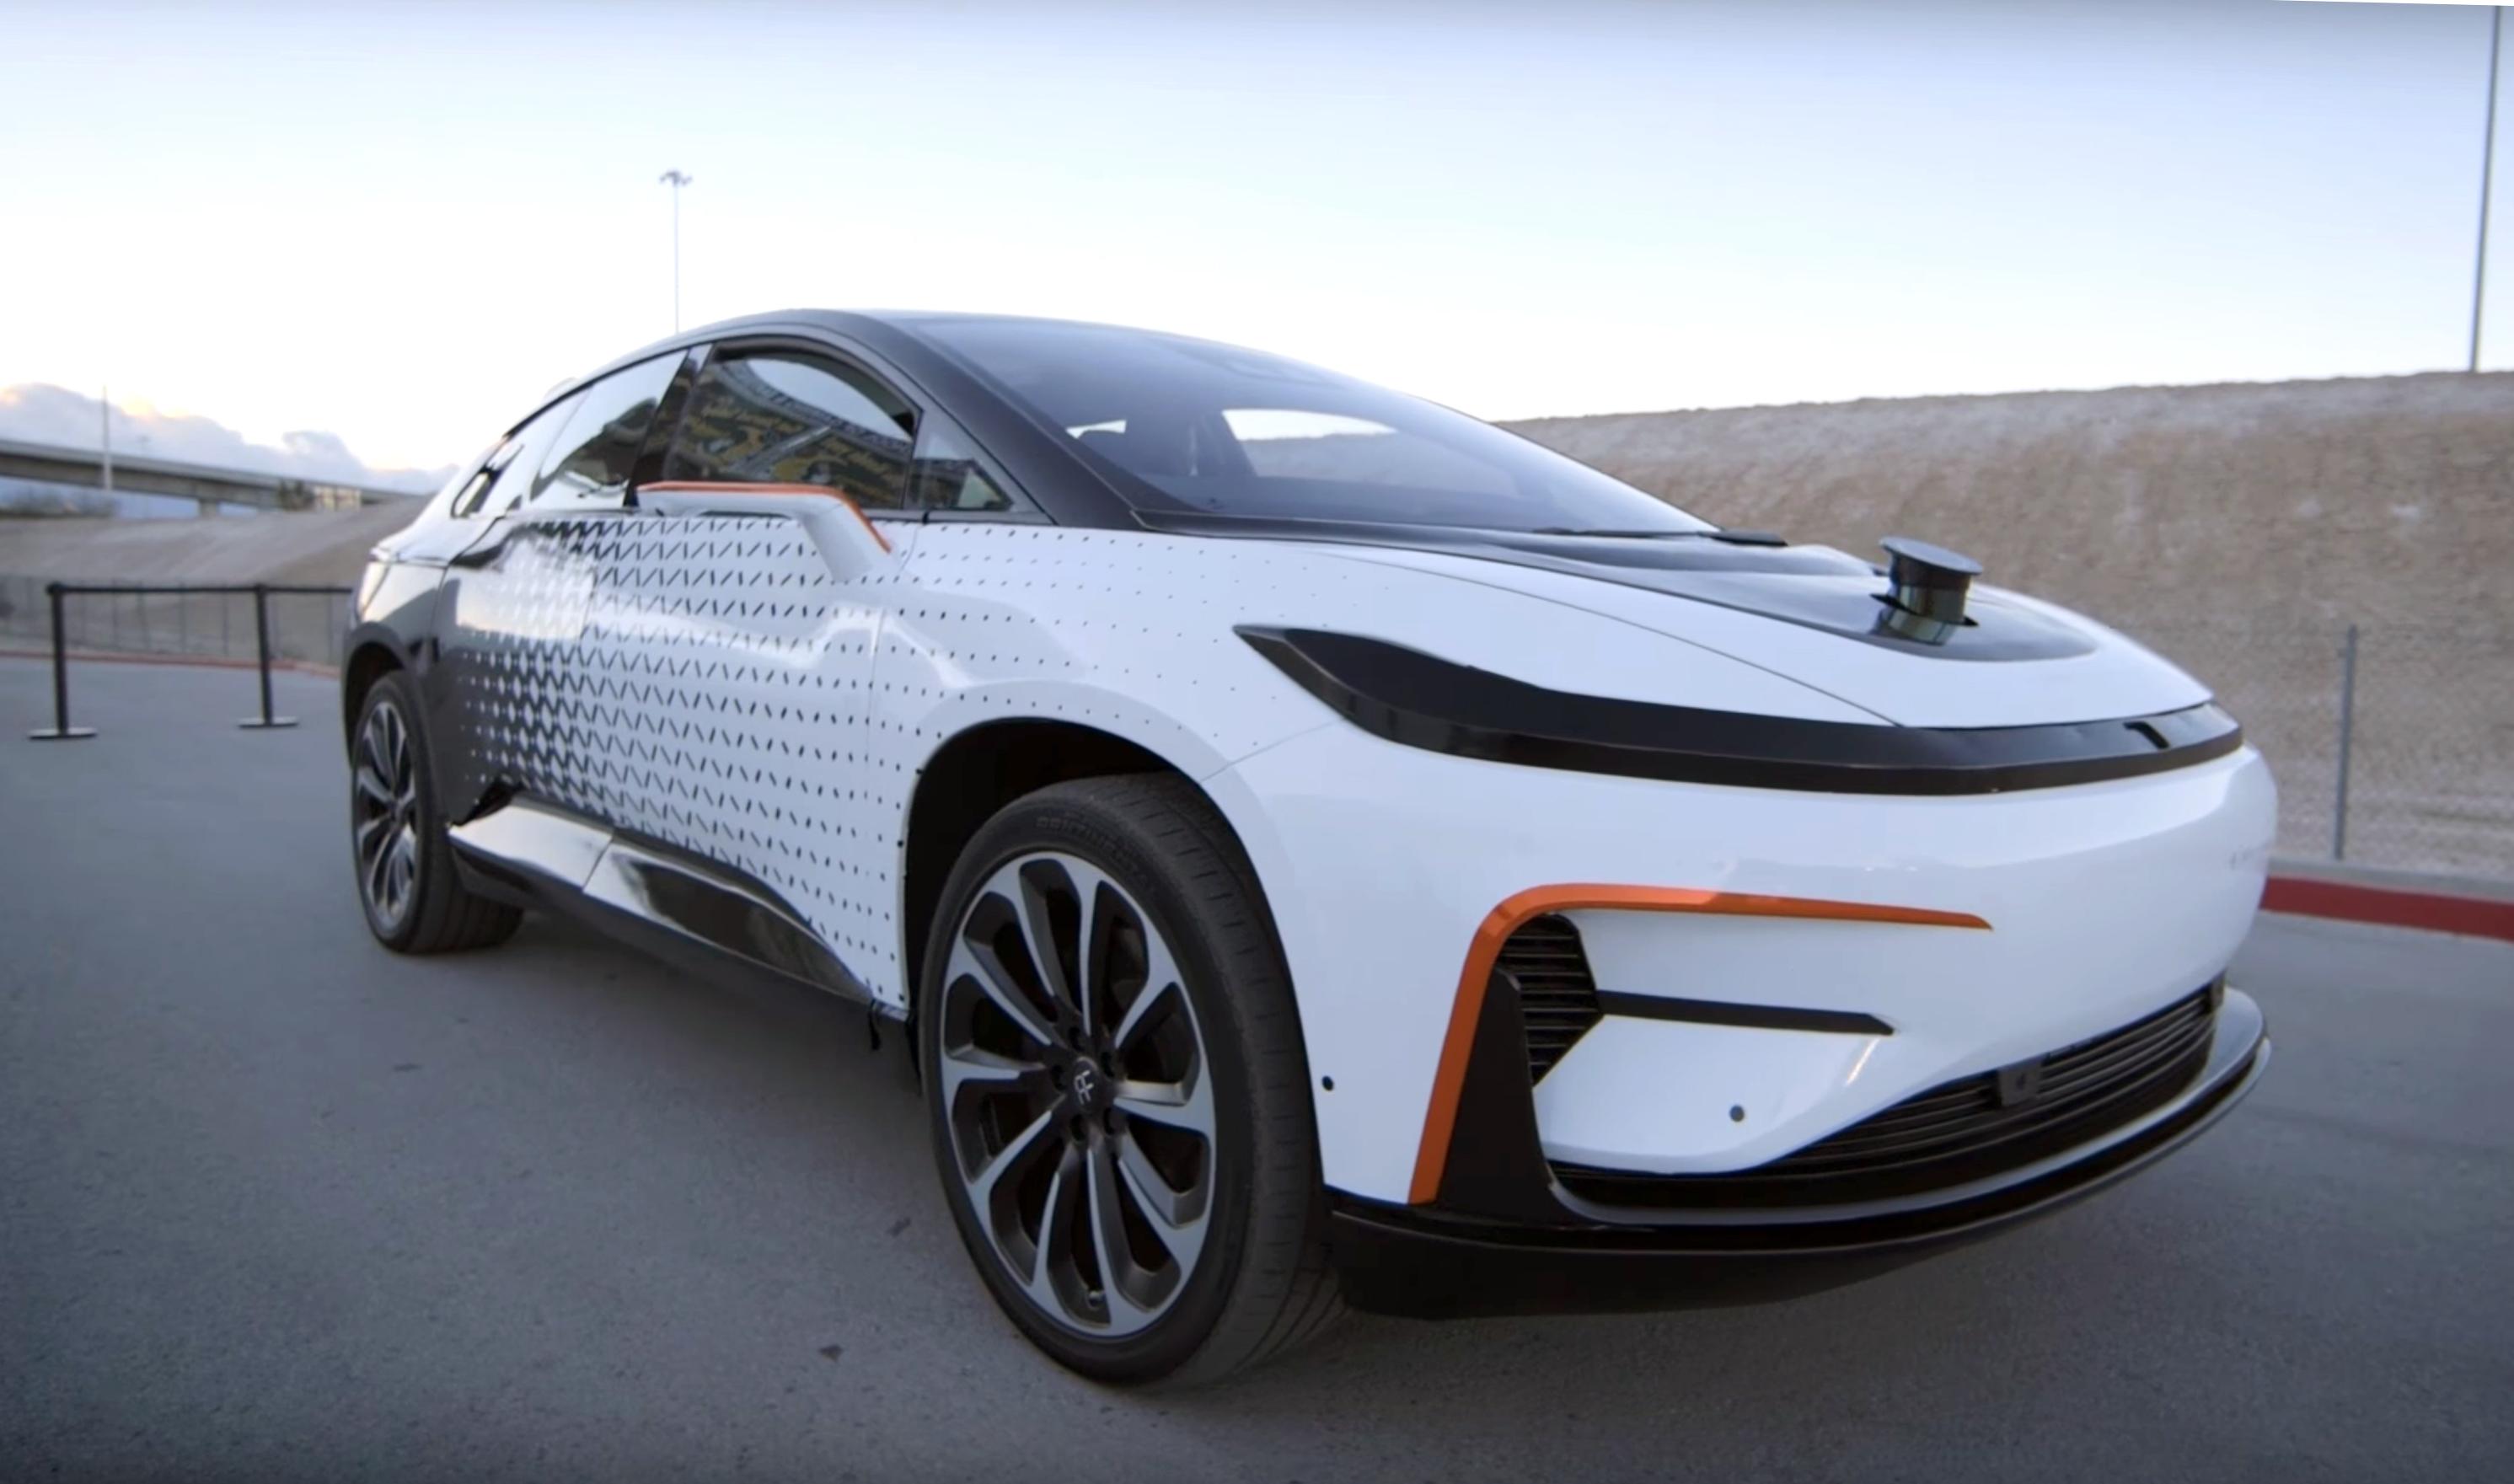 faraday future abandons plan to build 1 billion electric car